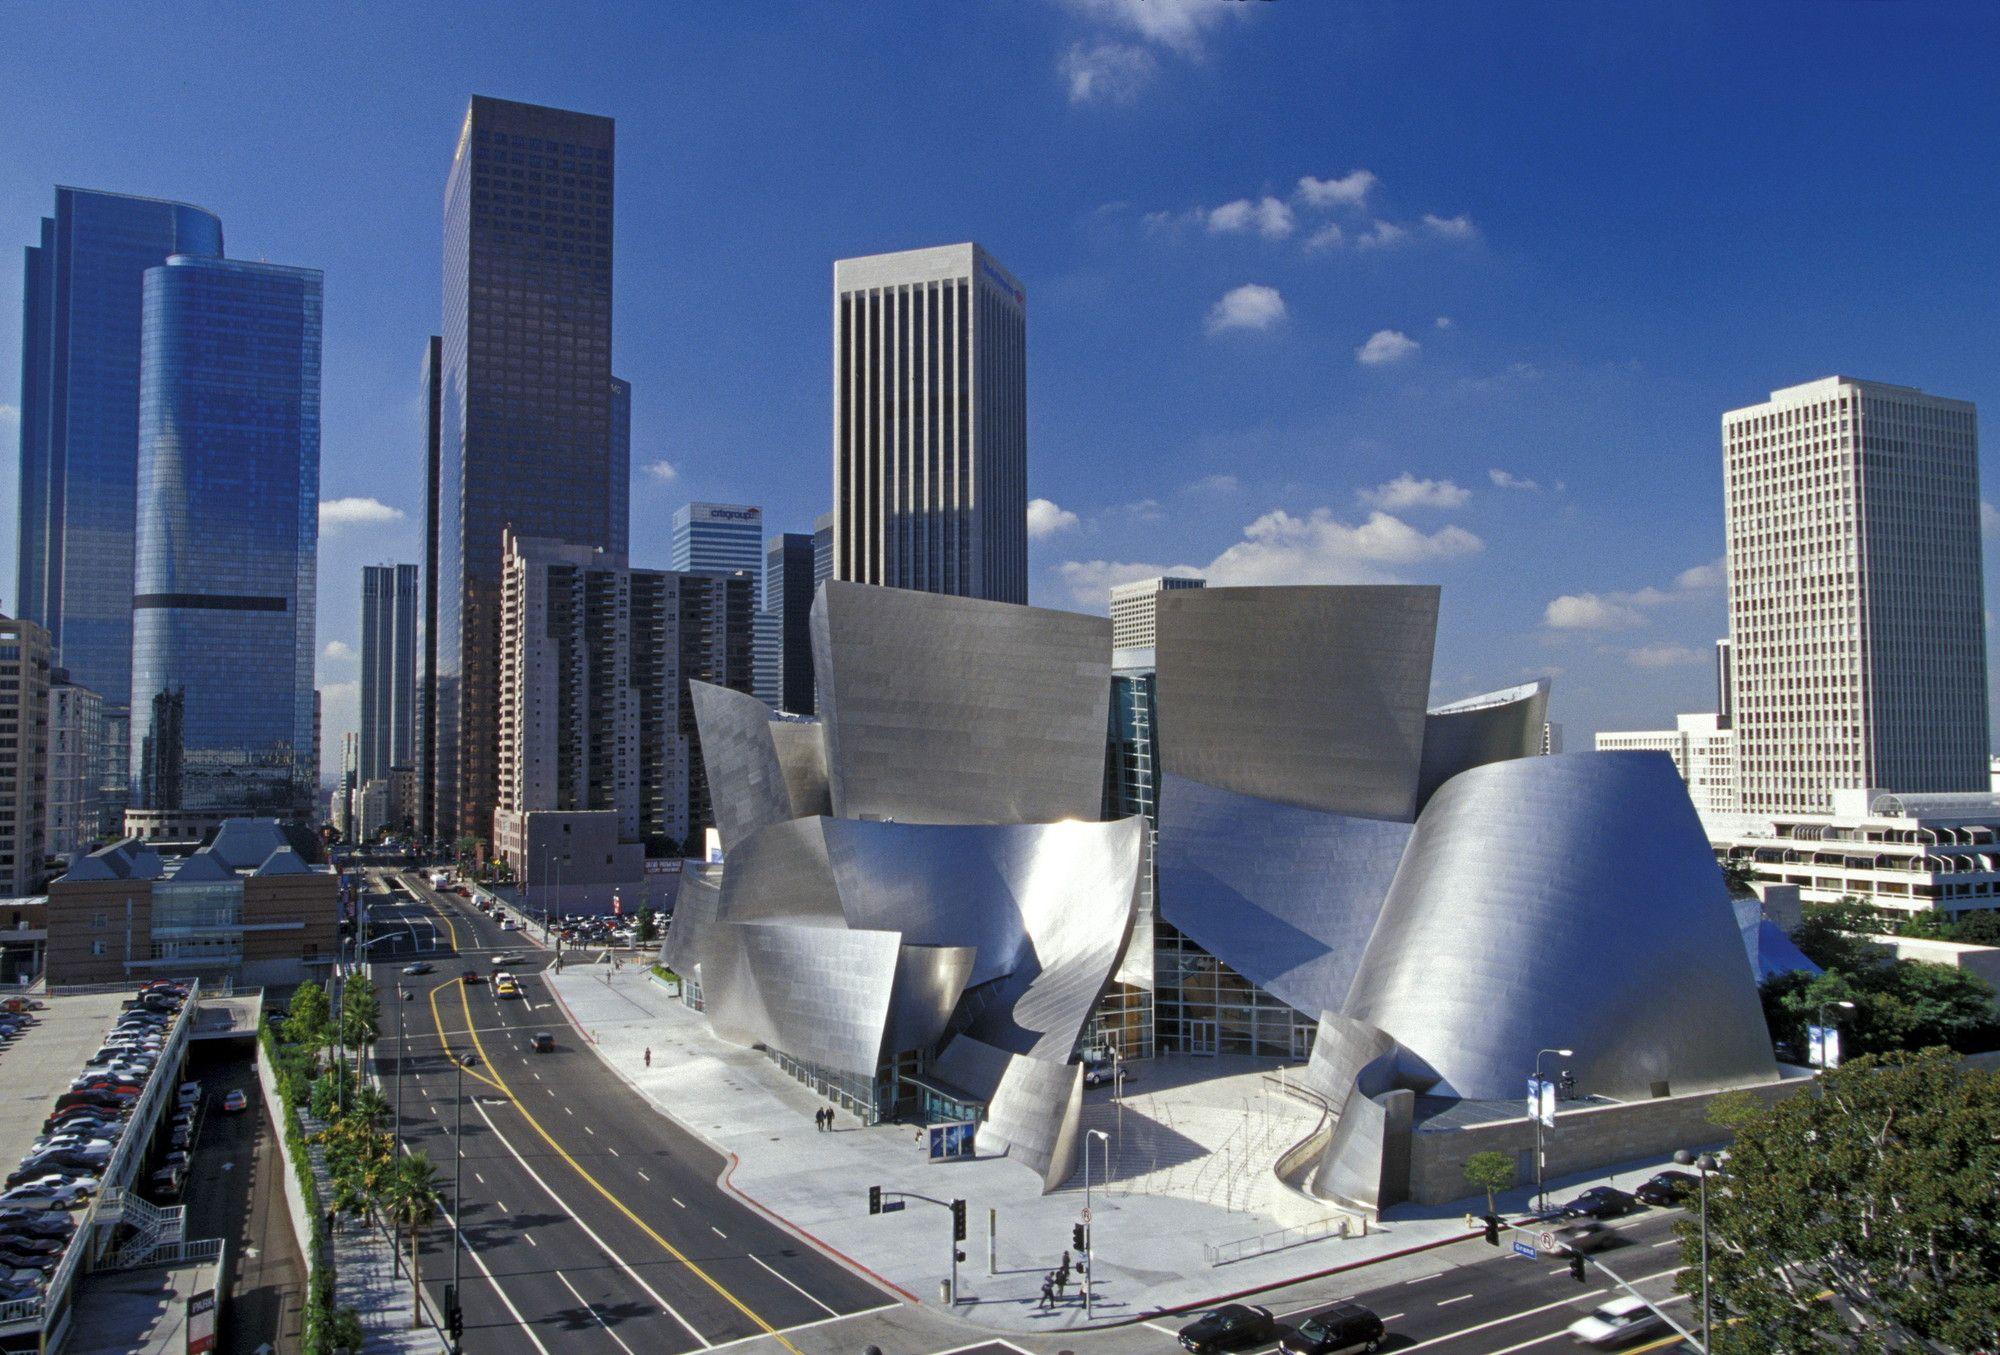 Gallery Of Ad Classics Walt Disney Concert Hall Frank Gehry 1 Walt Disney Concert Hall Frank Gehry Disney Hall